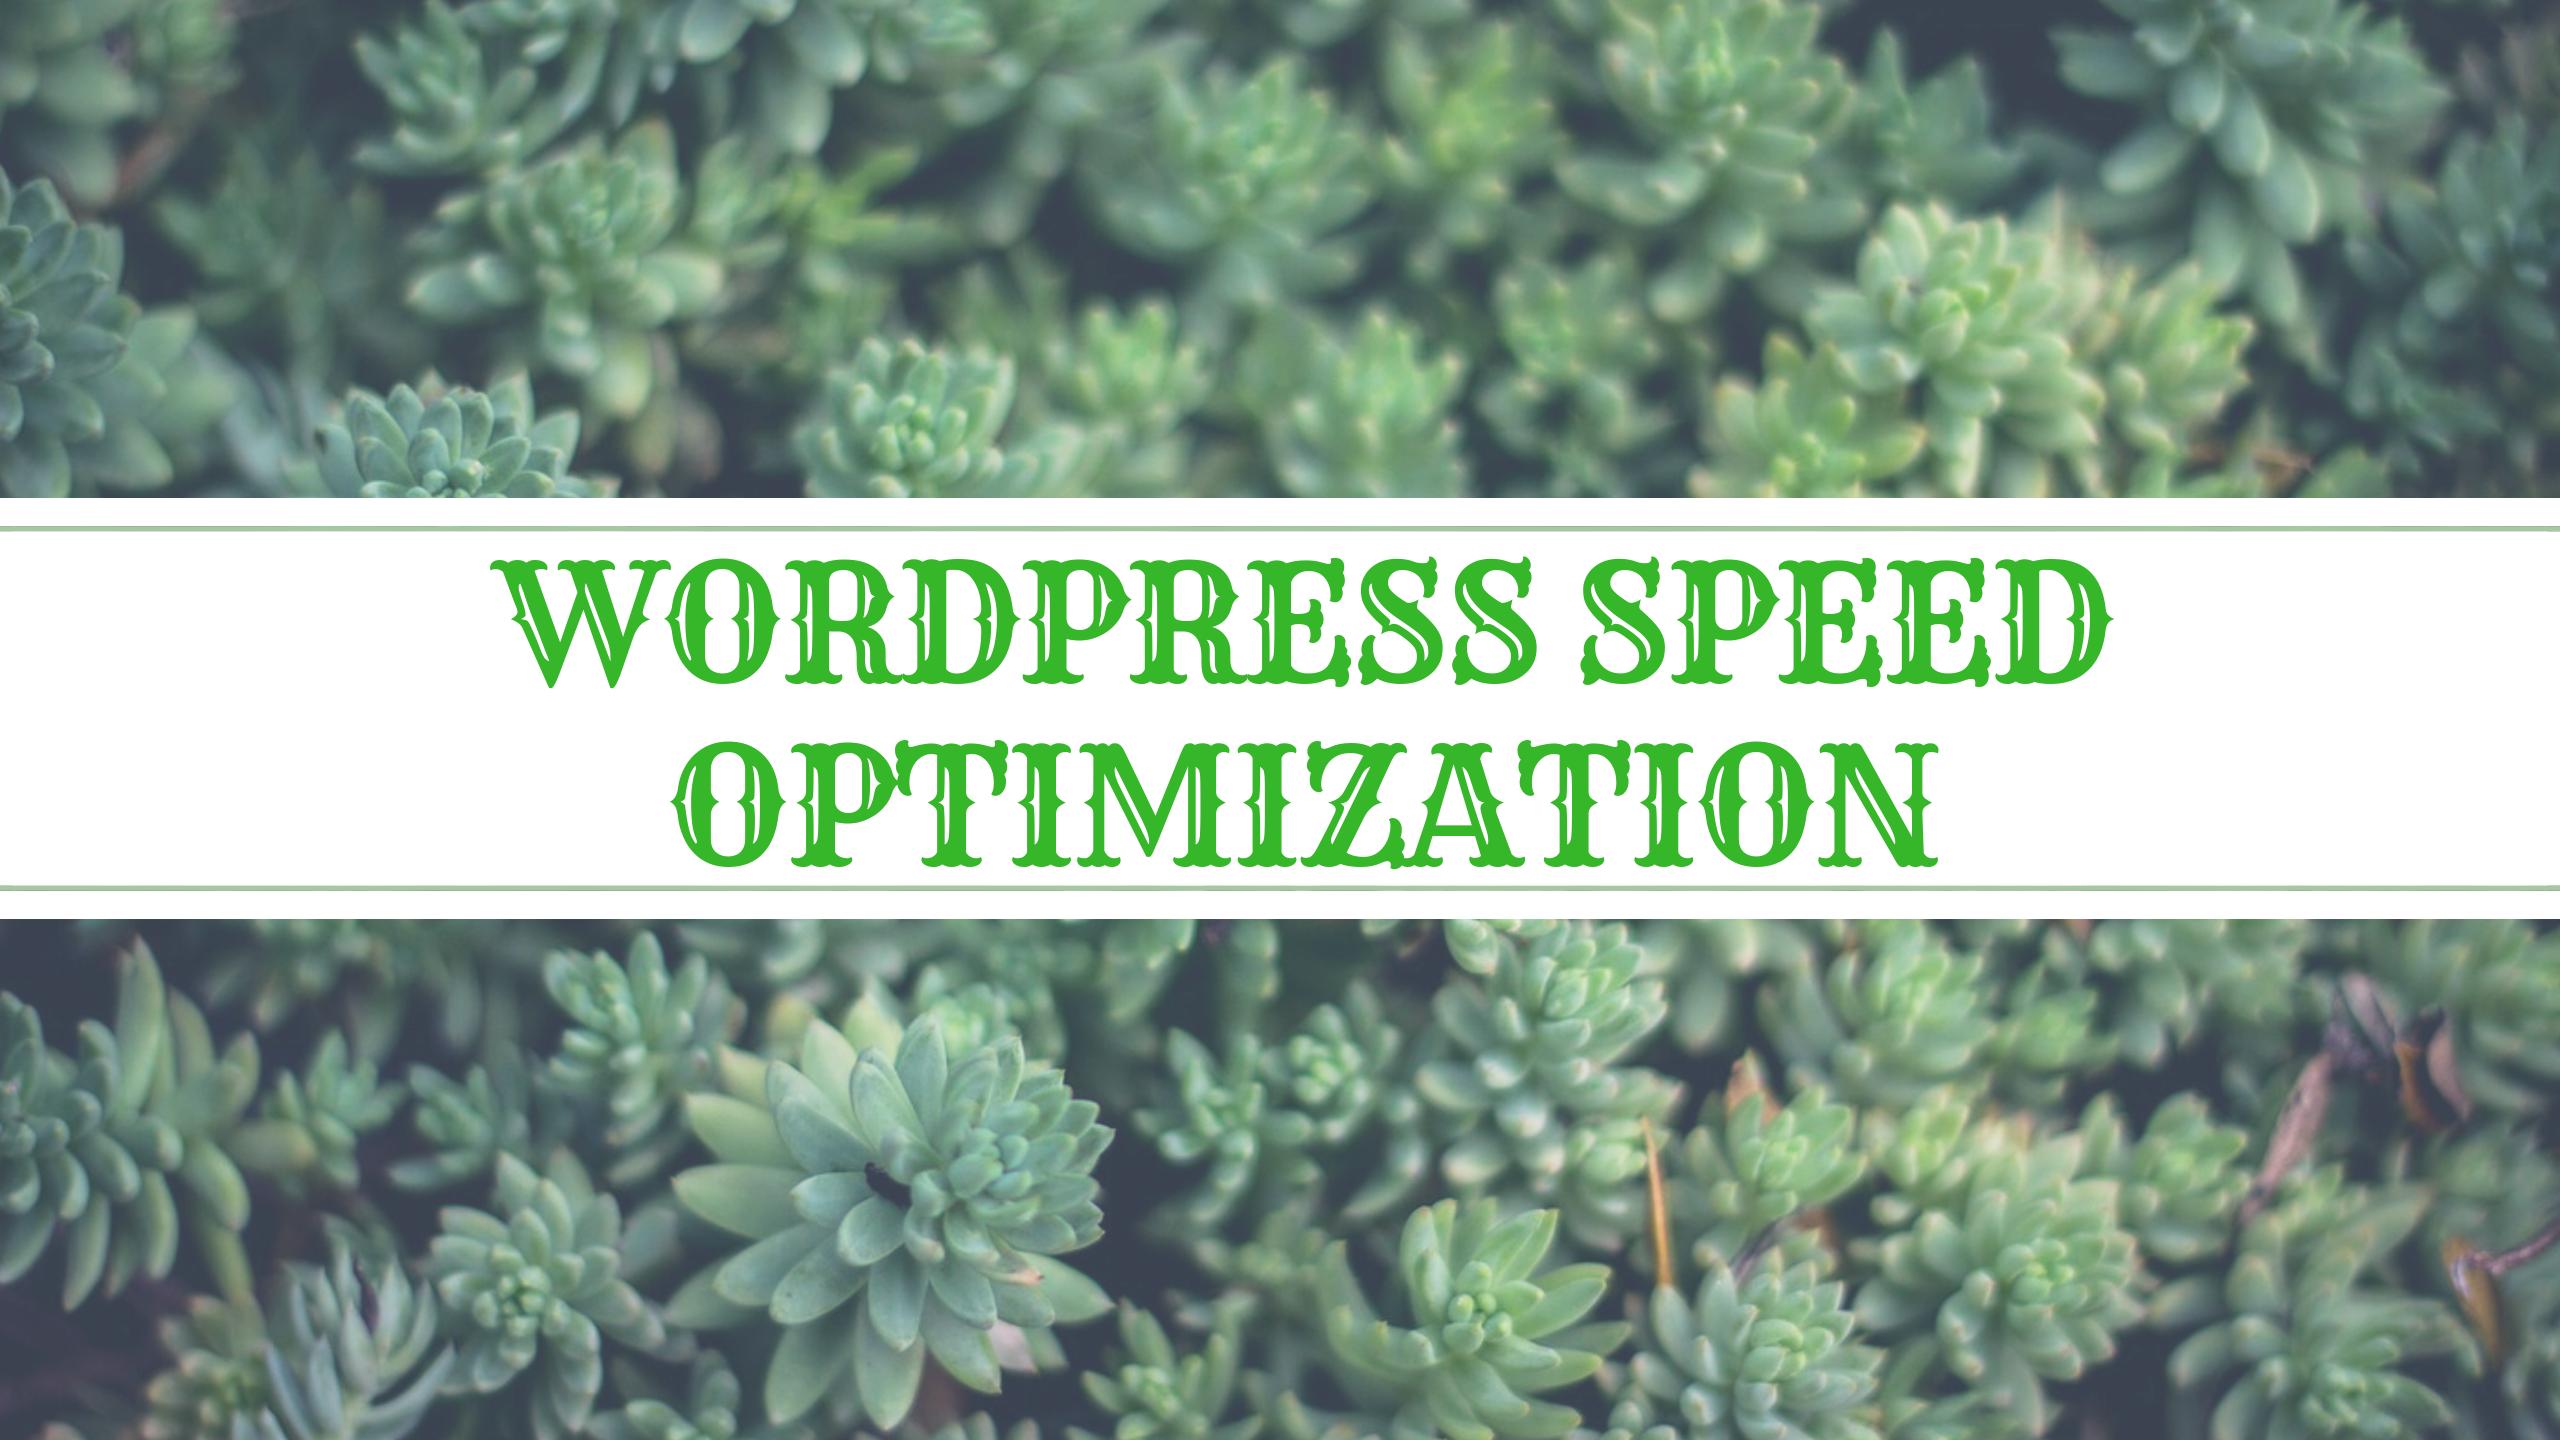 Wordpress Speed optimization,  Boost up your WordPress site performance